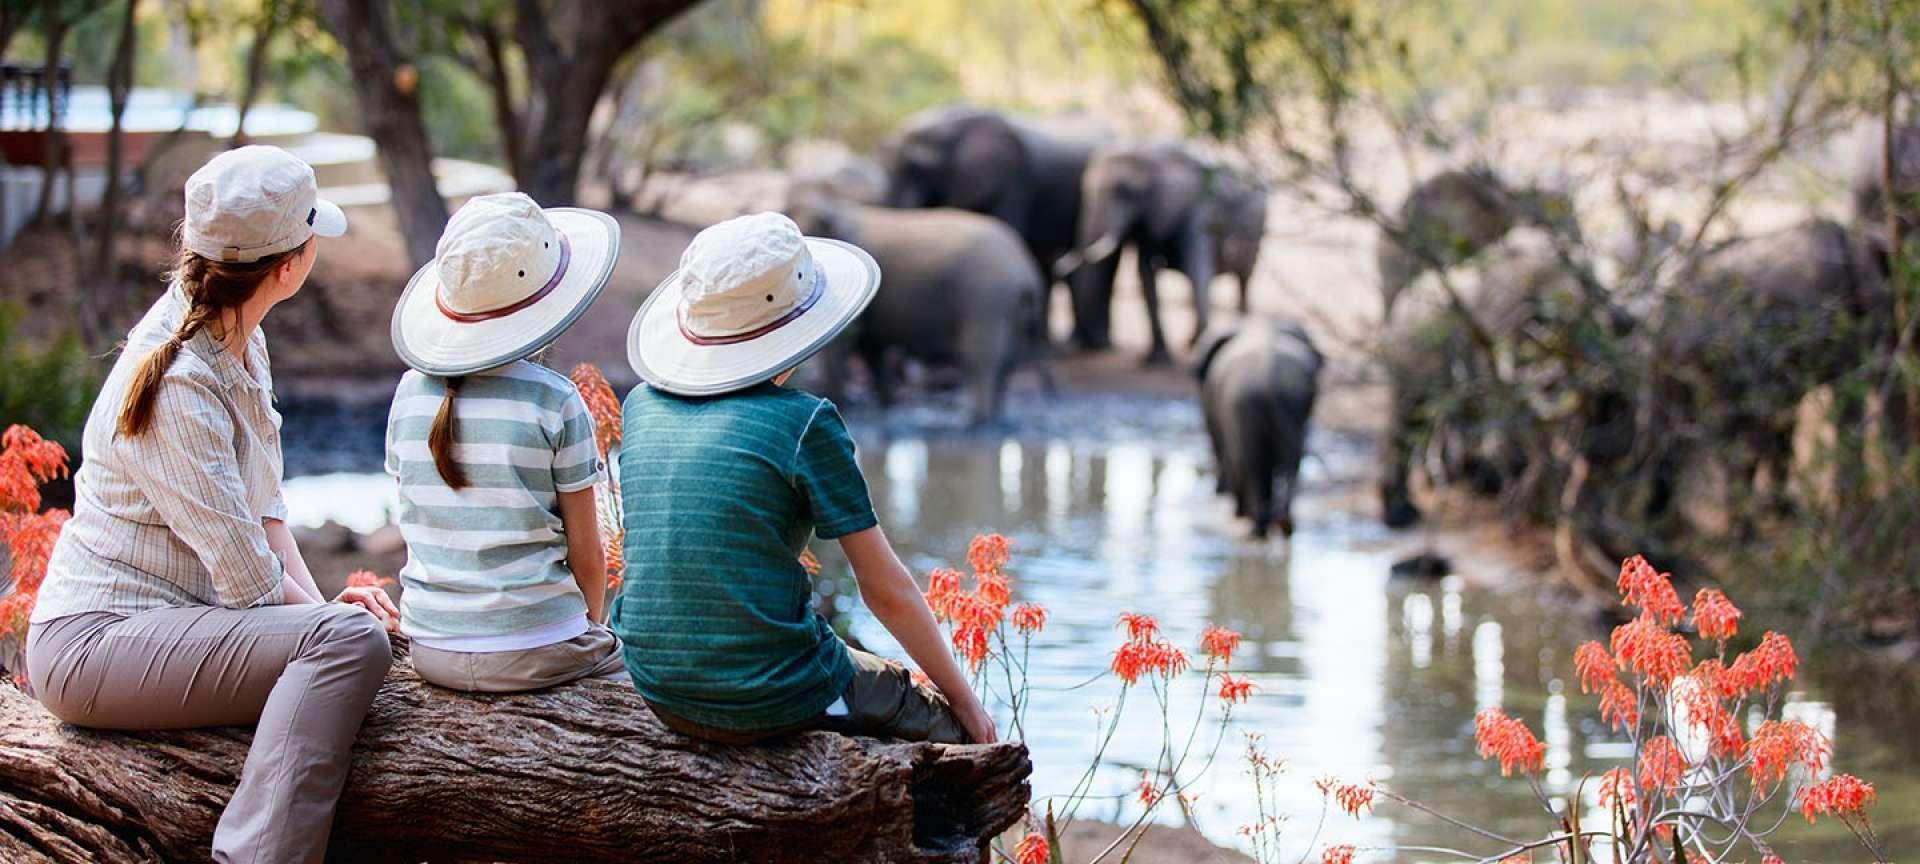 Family & kid friendly safaris in Africa - Africa Wildlife Safaris